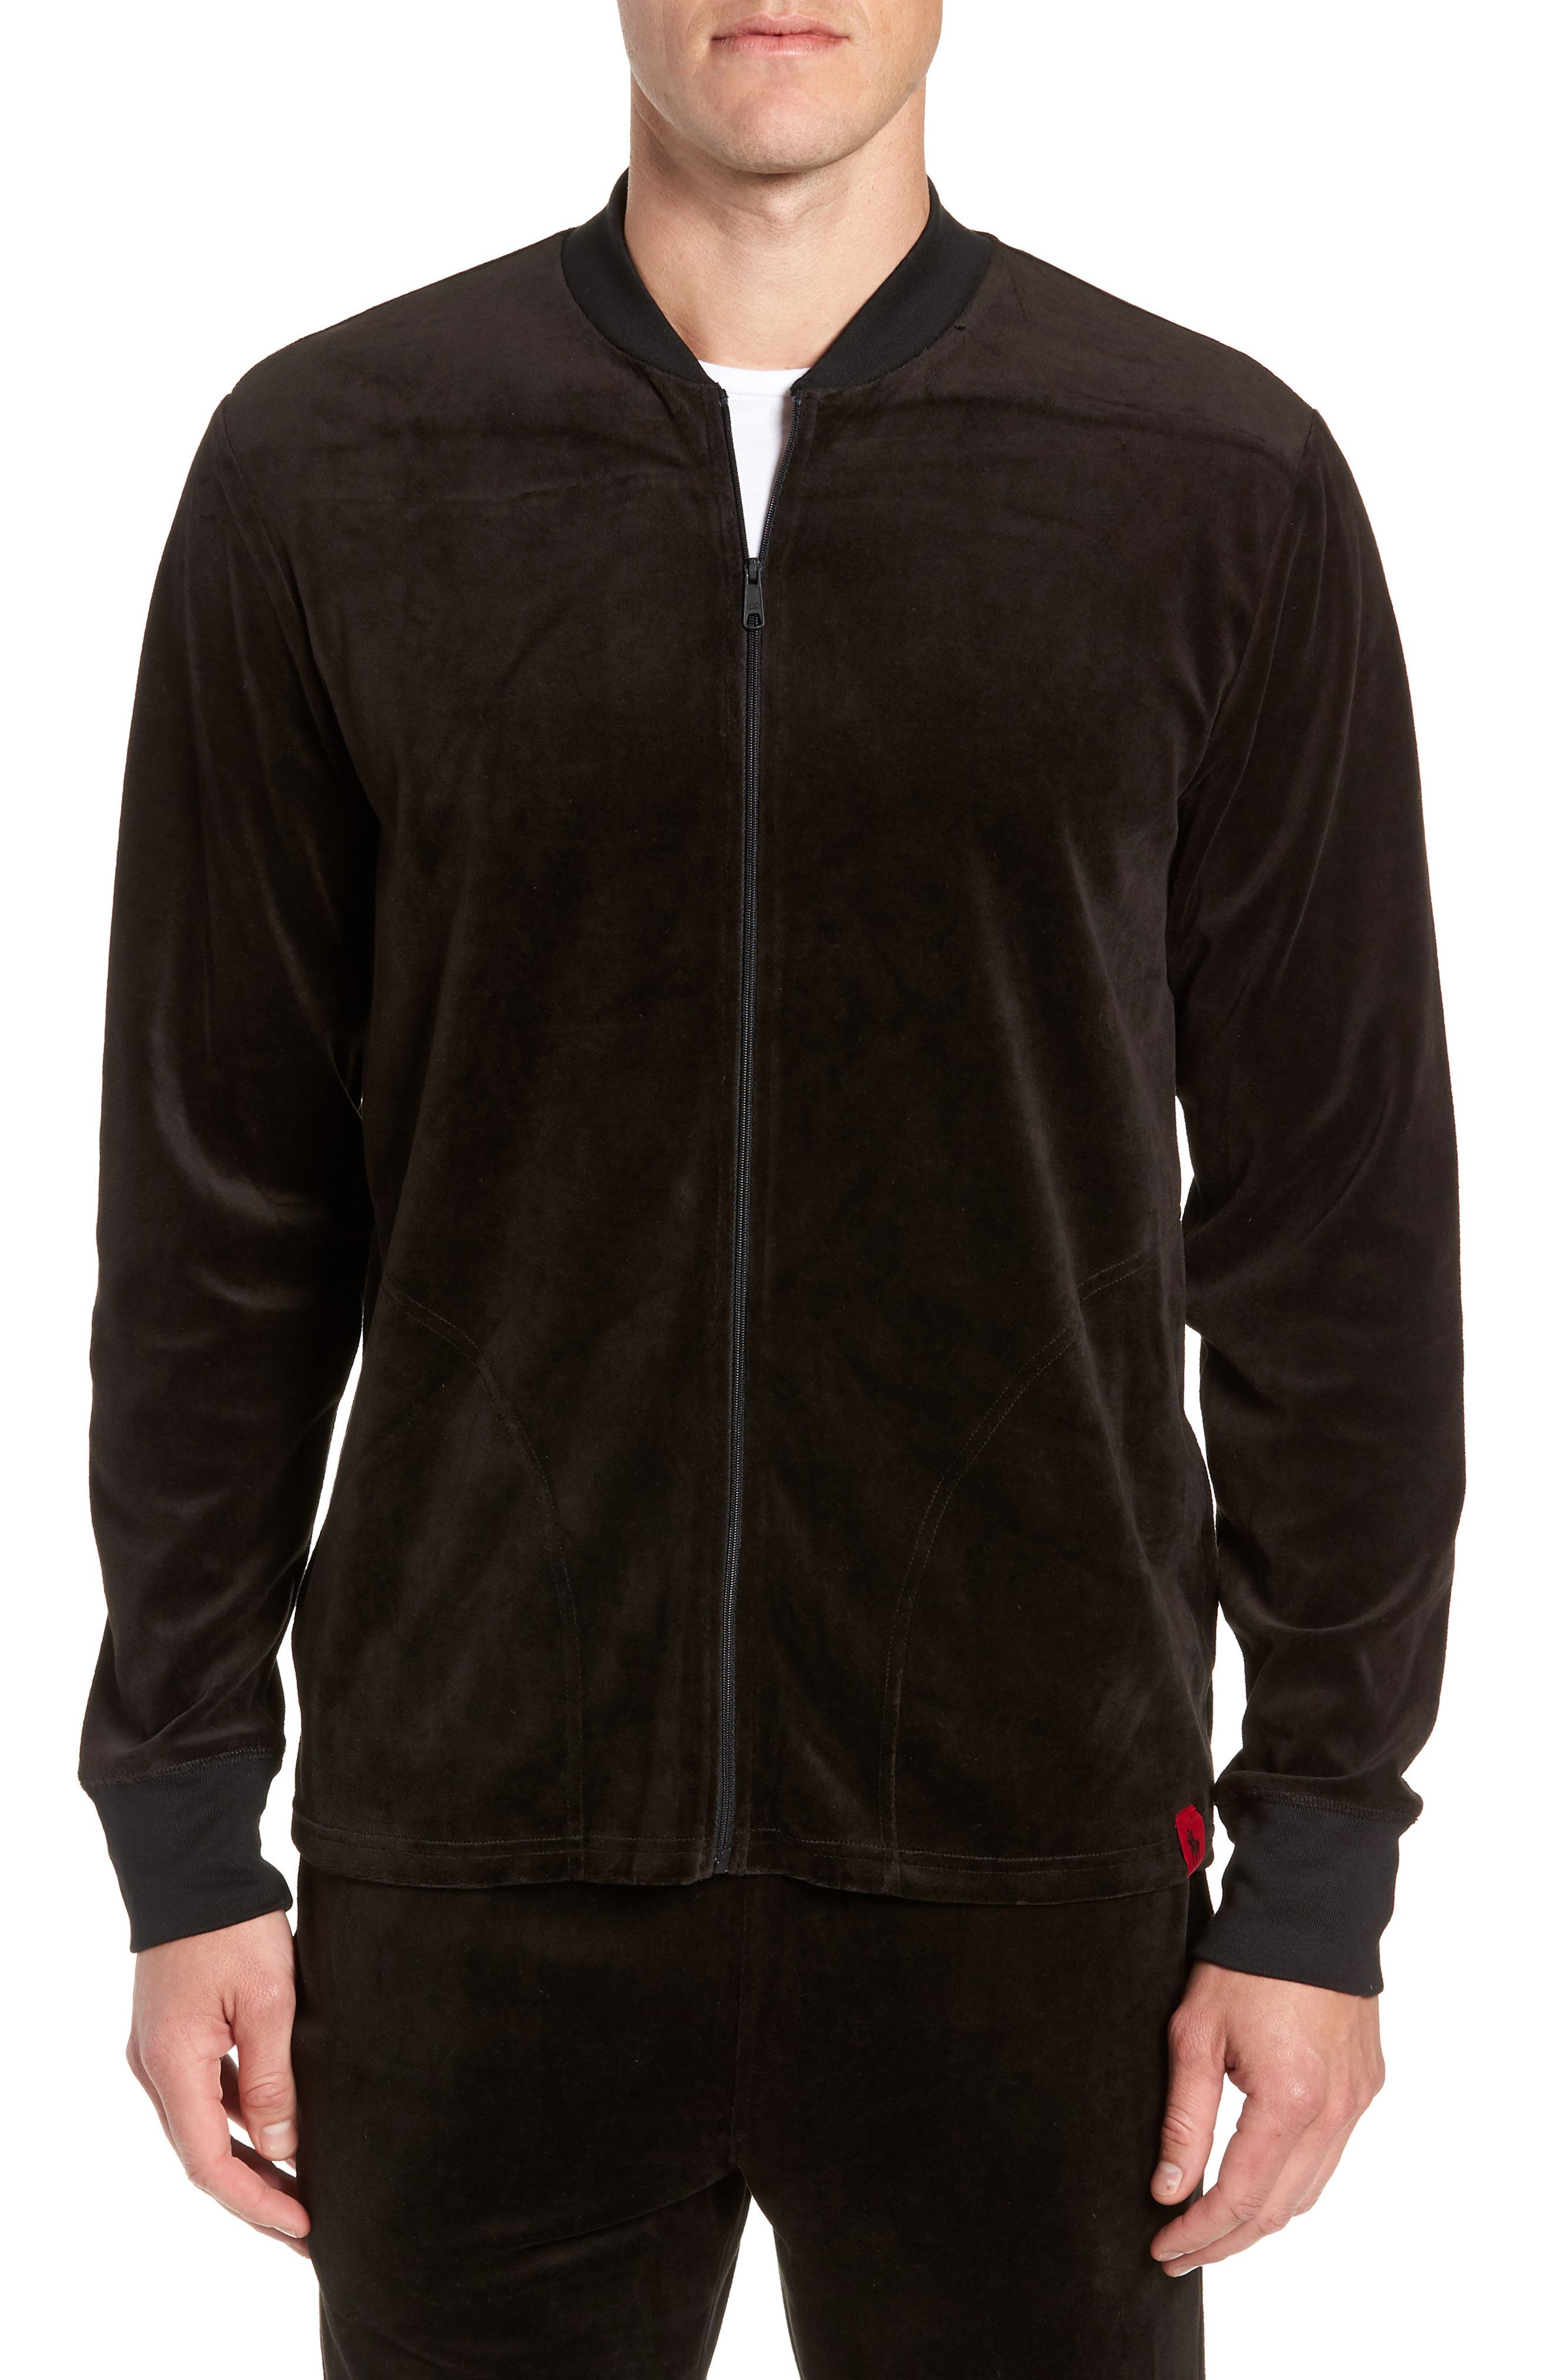 Velour Jacket,                             Main thumbnail 1, color,                             POLO BLACK